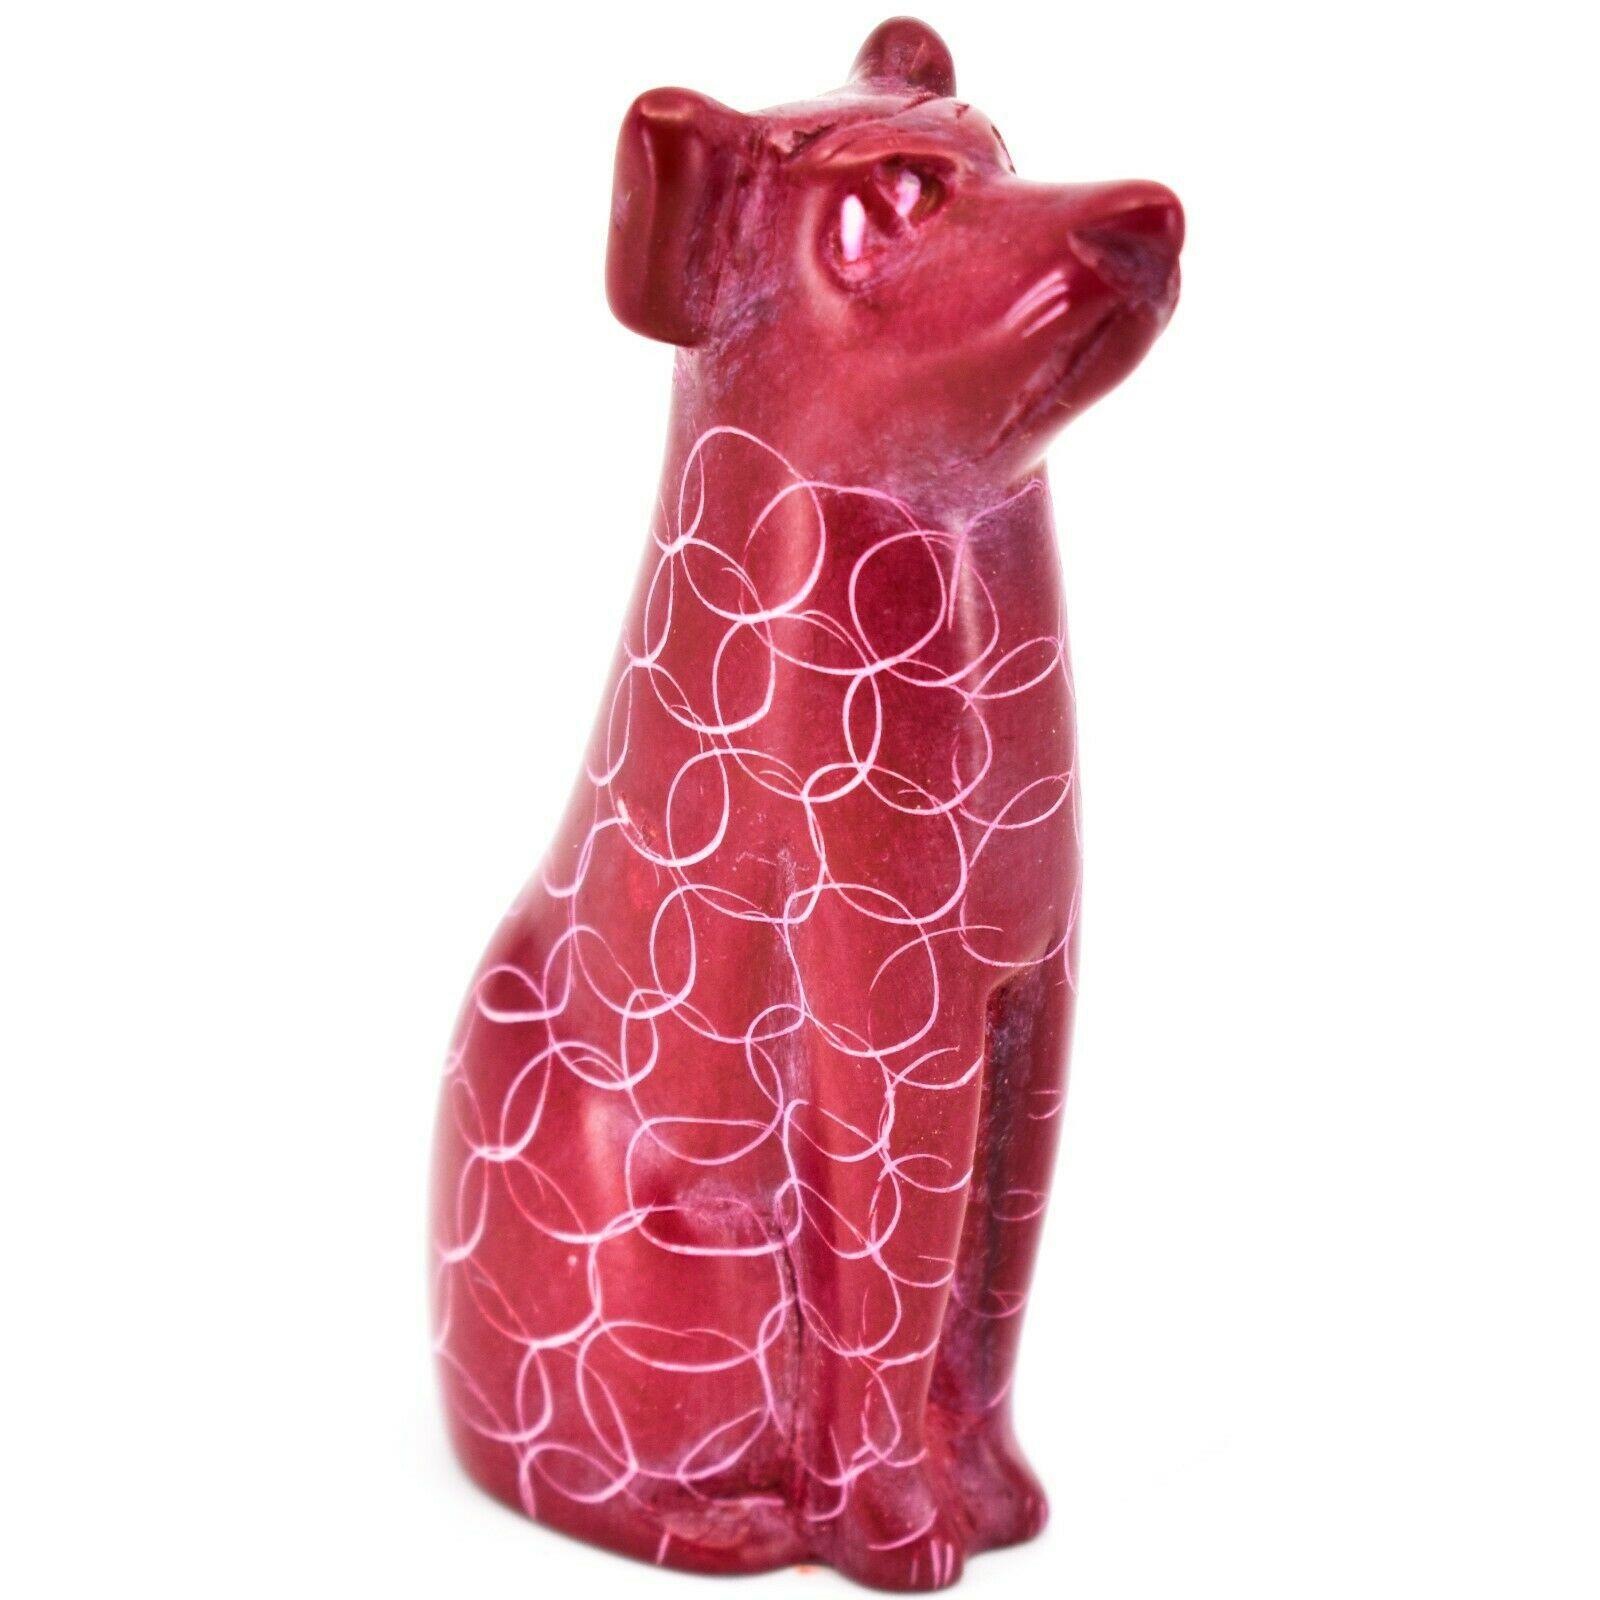 Vaneal Group Hand Carved Kisii Soapstone Sitting Red Puppy Dog Figurine Kenya